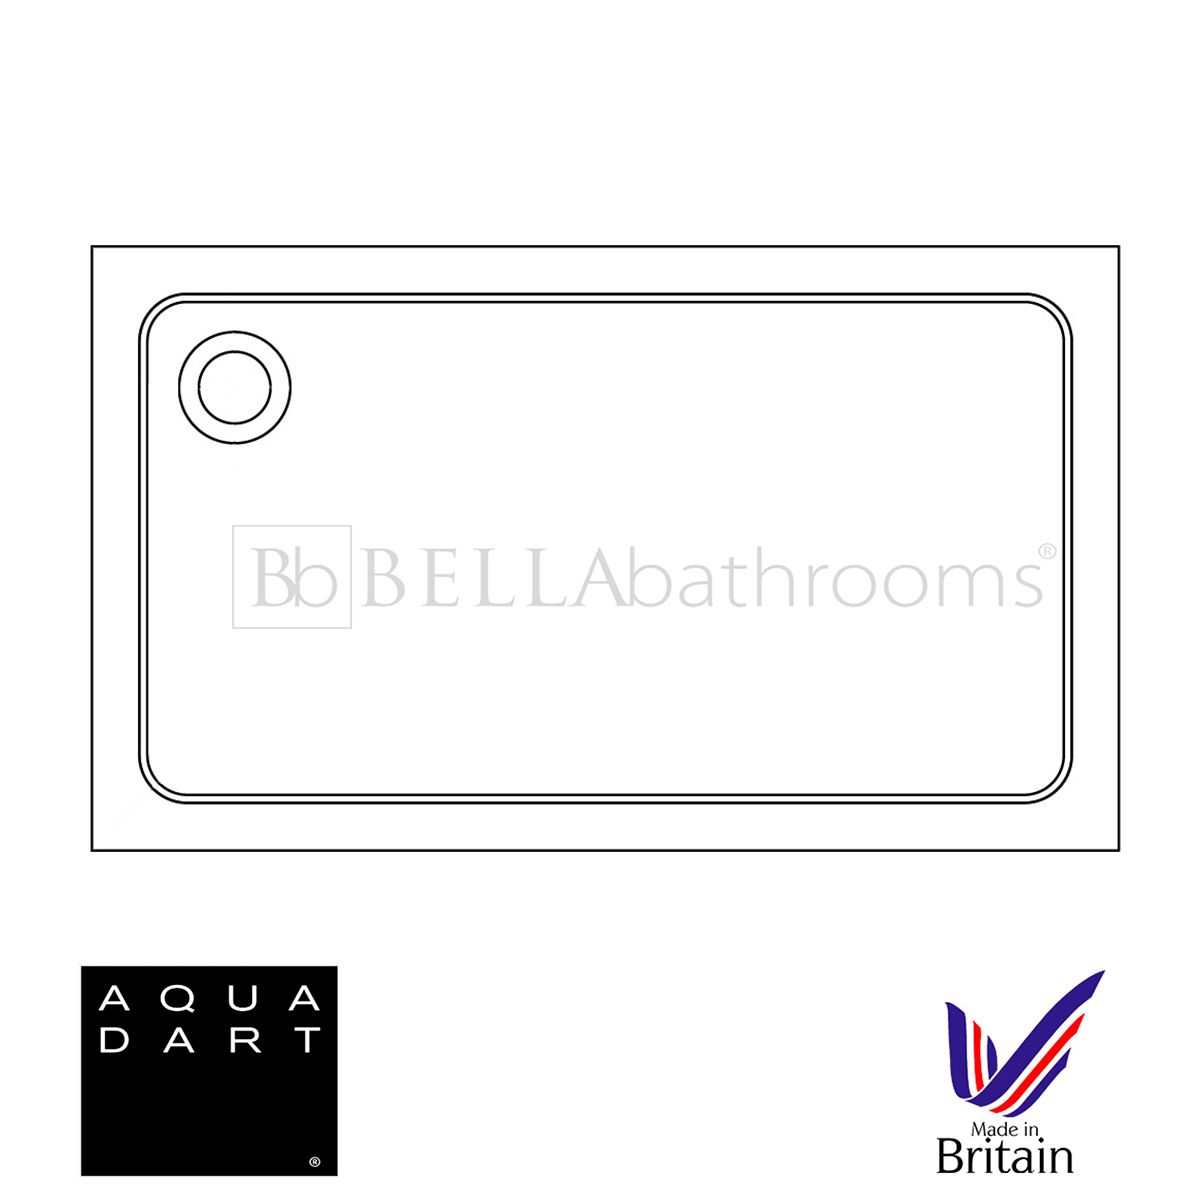 Aquadart Rectangular 800 x 700 Shower Tray